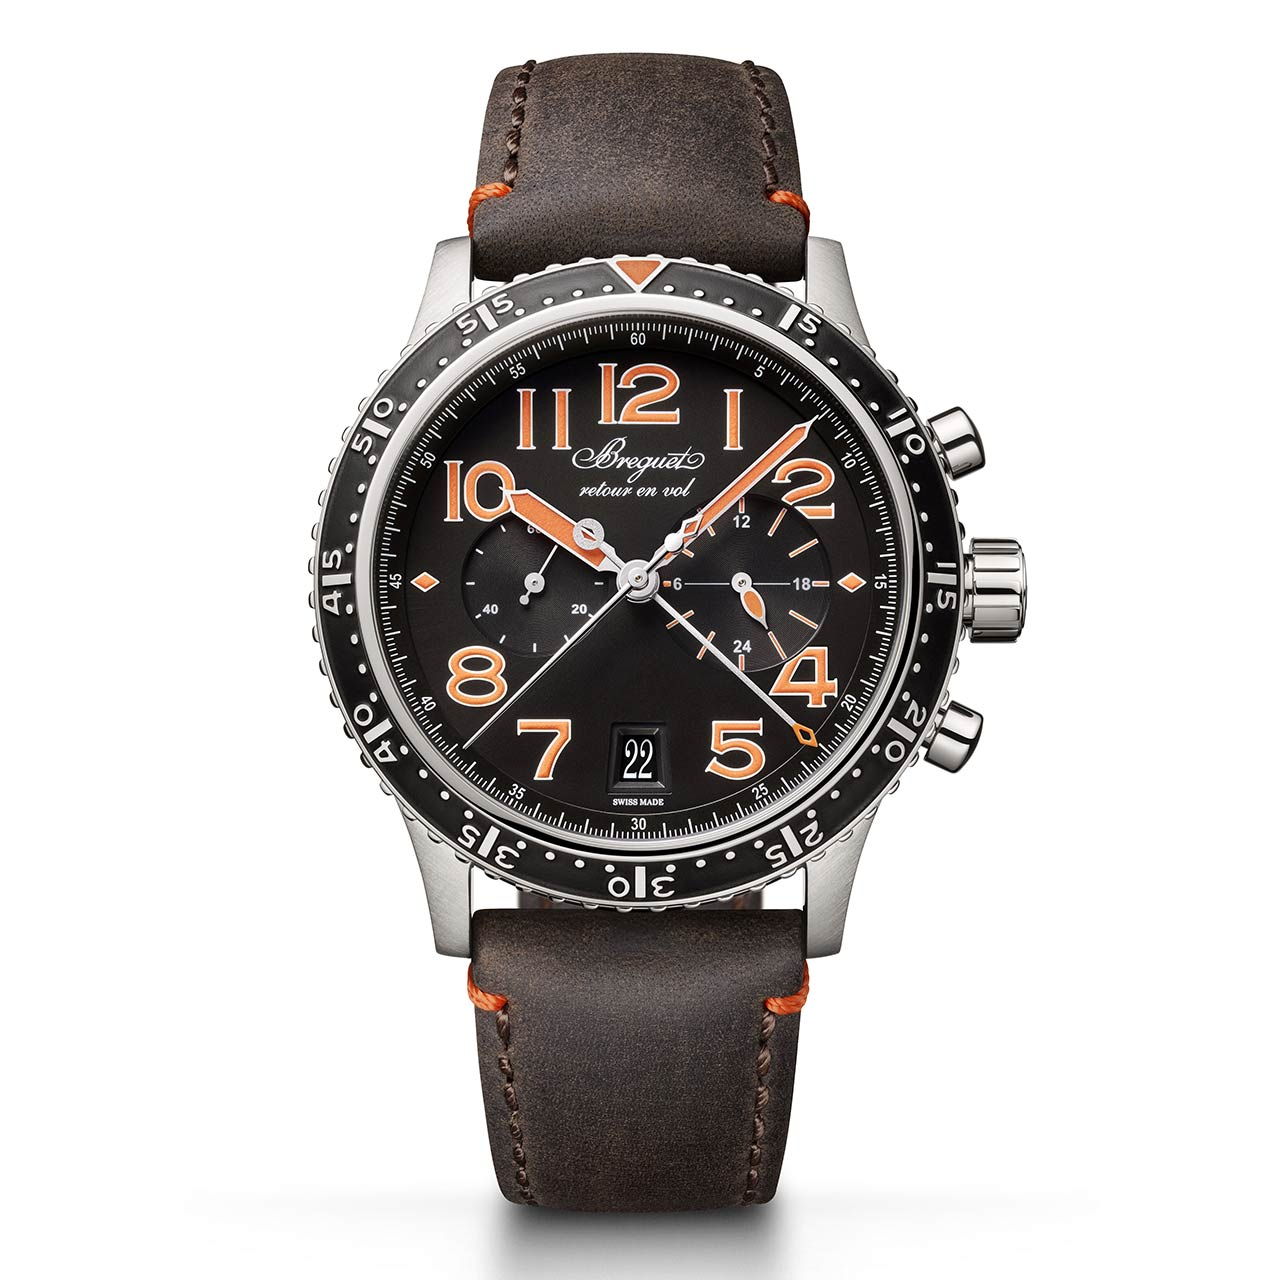 Breguet Type XXI 3815 Orange Limited edition 3815TI:HO:3ZU Frontal